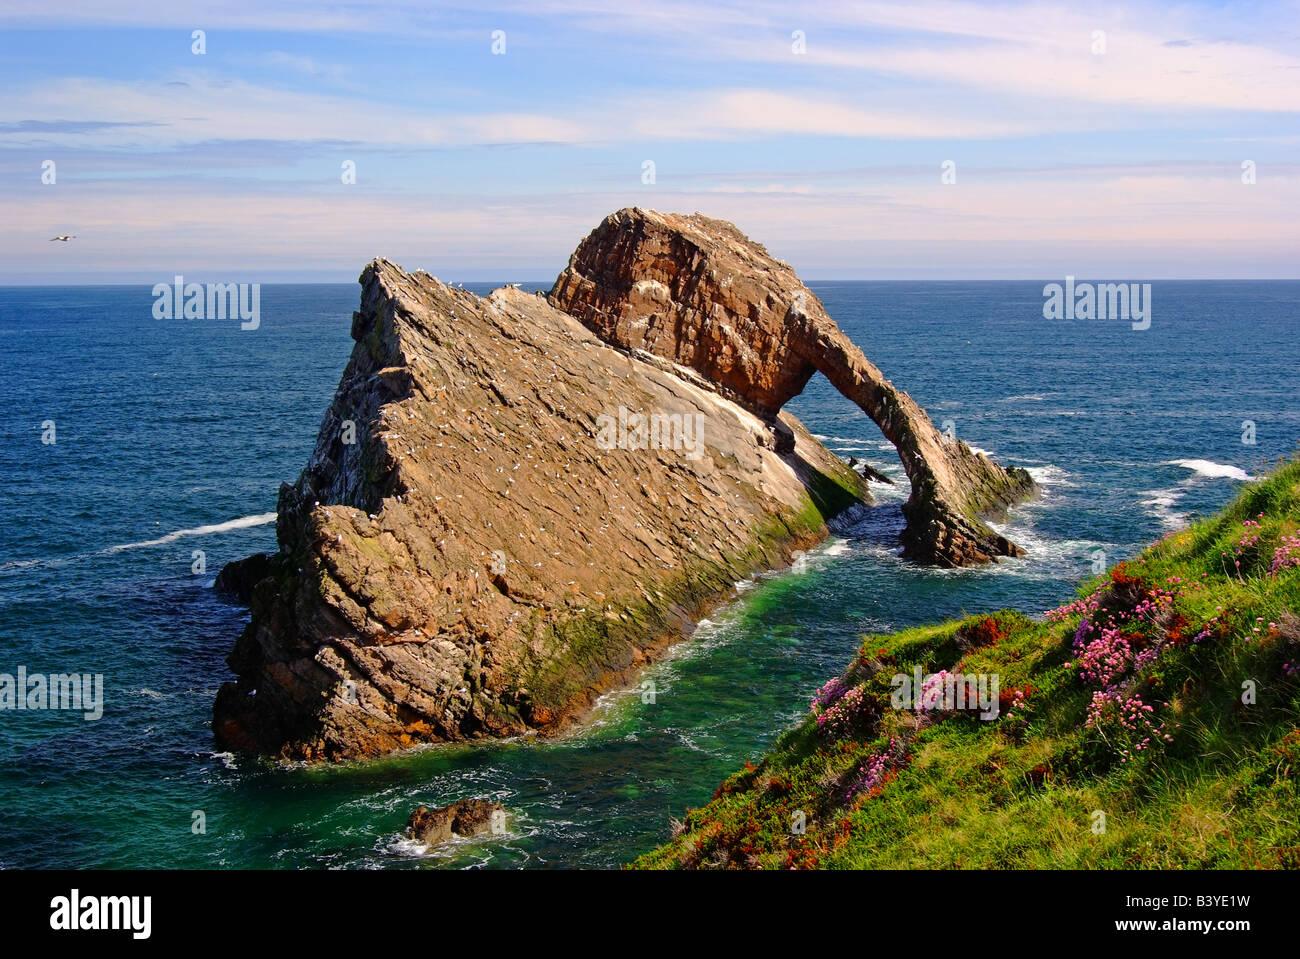 uk scotland grampian banff the bow fiddle rock near portknockie and north sea - Stock Image